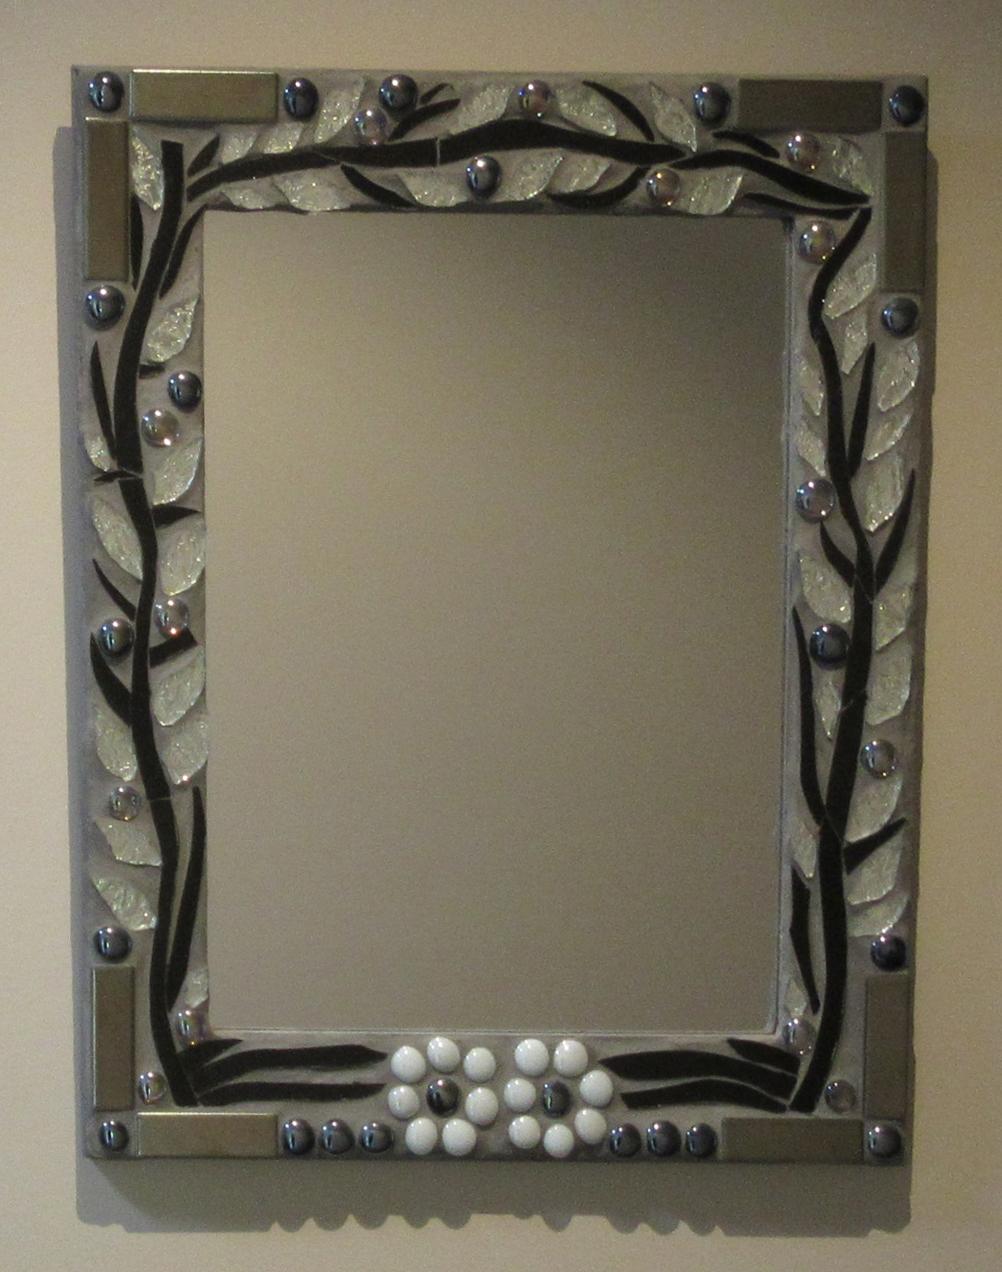 Sharon Carroll glass mosaic mirro silver &black